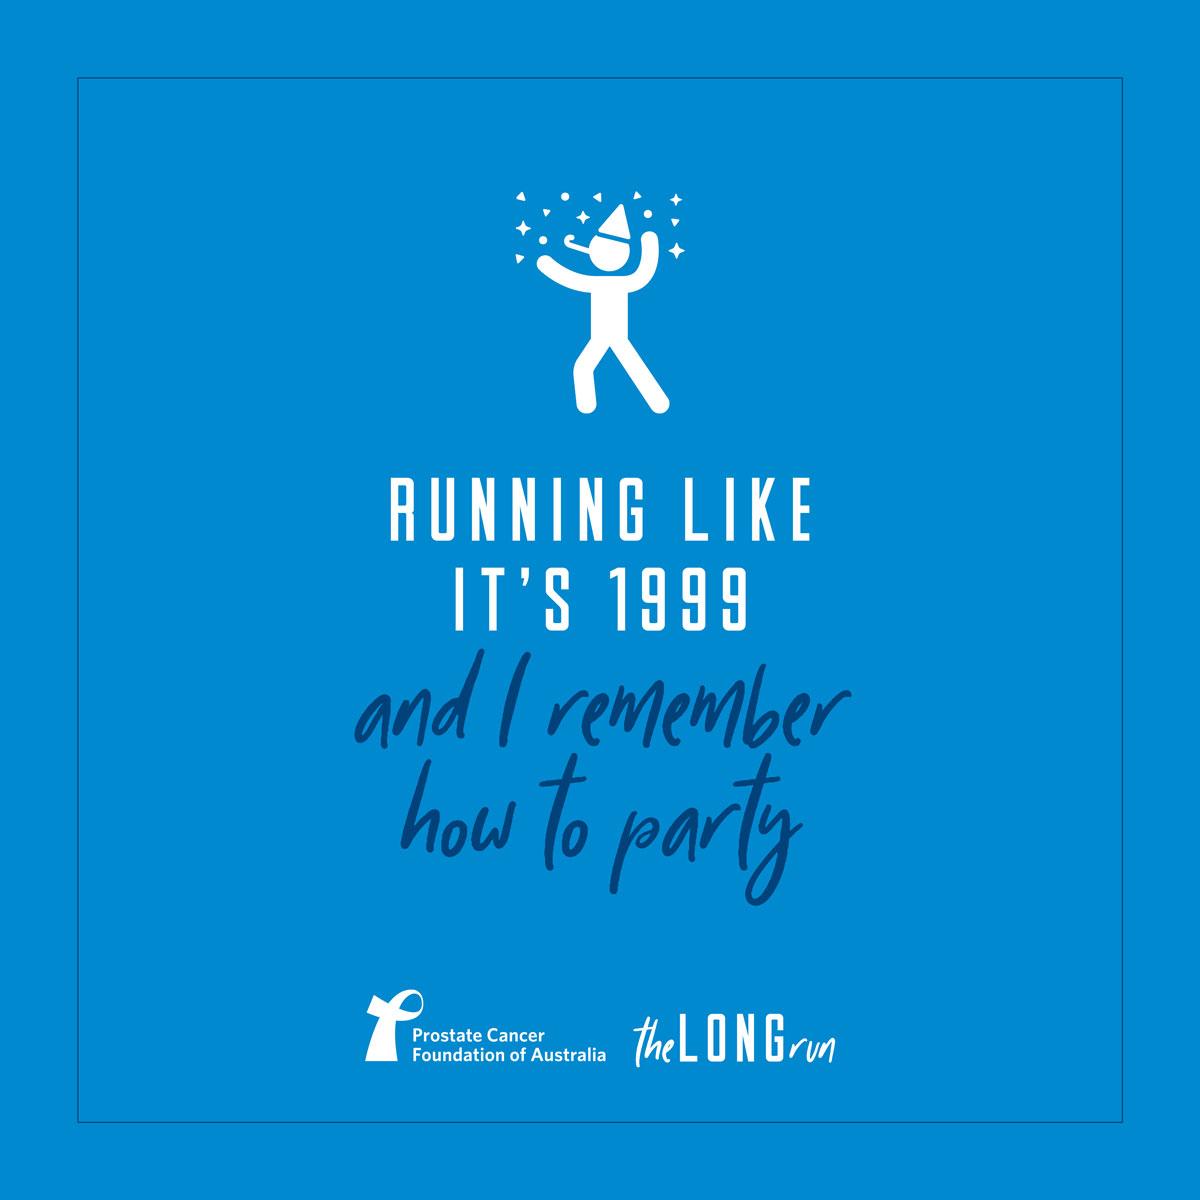 Running like it's 1999